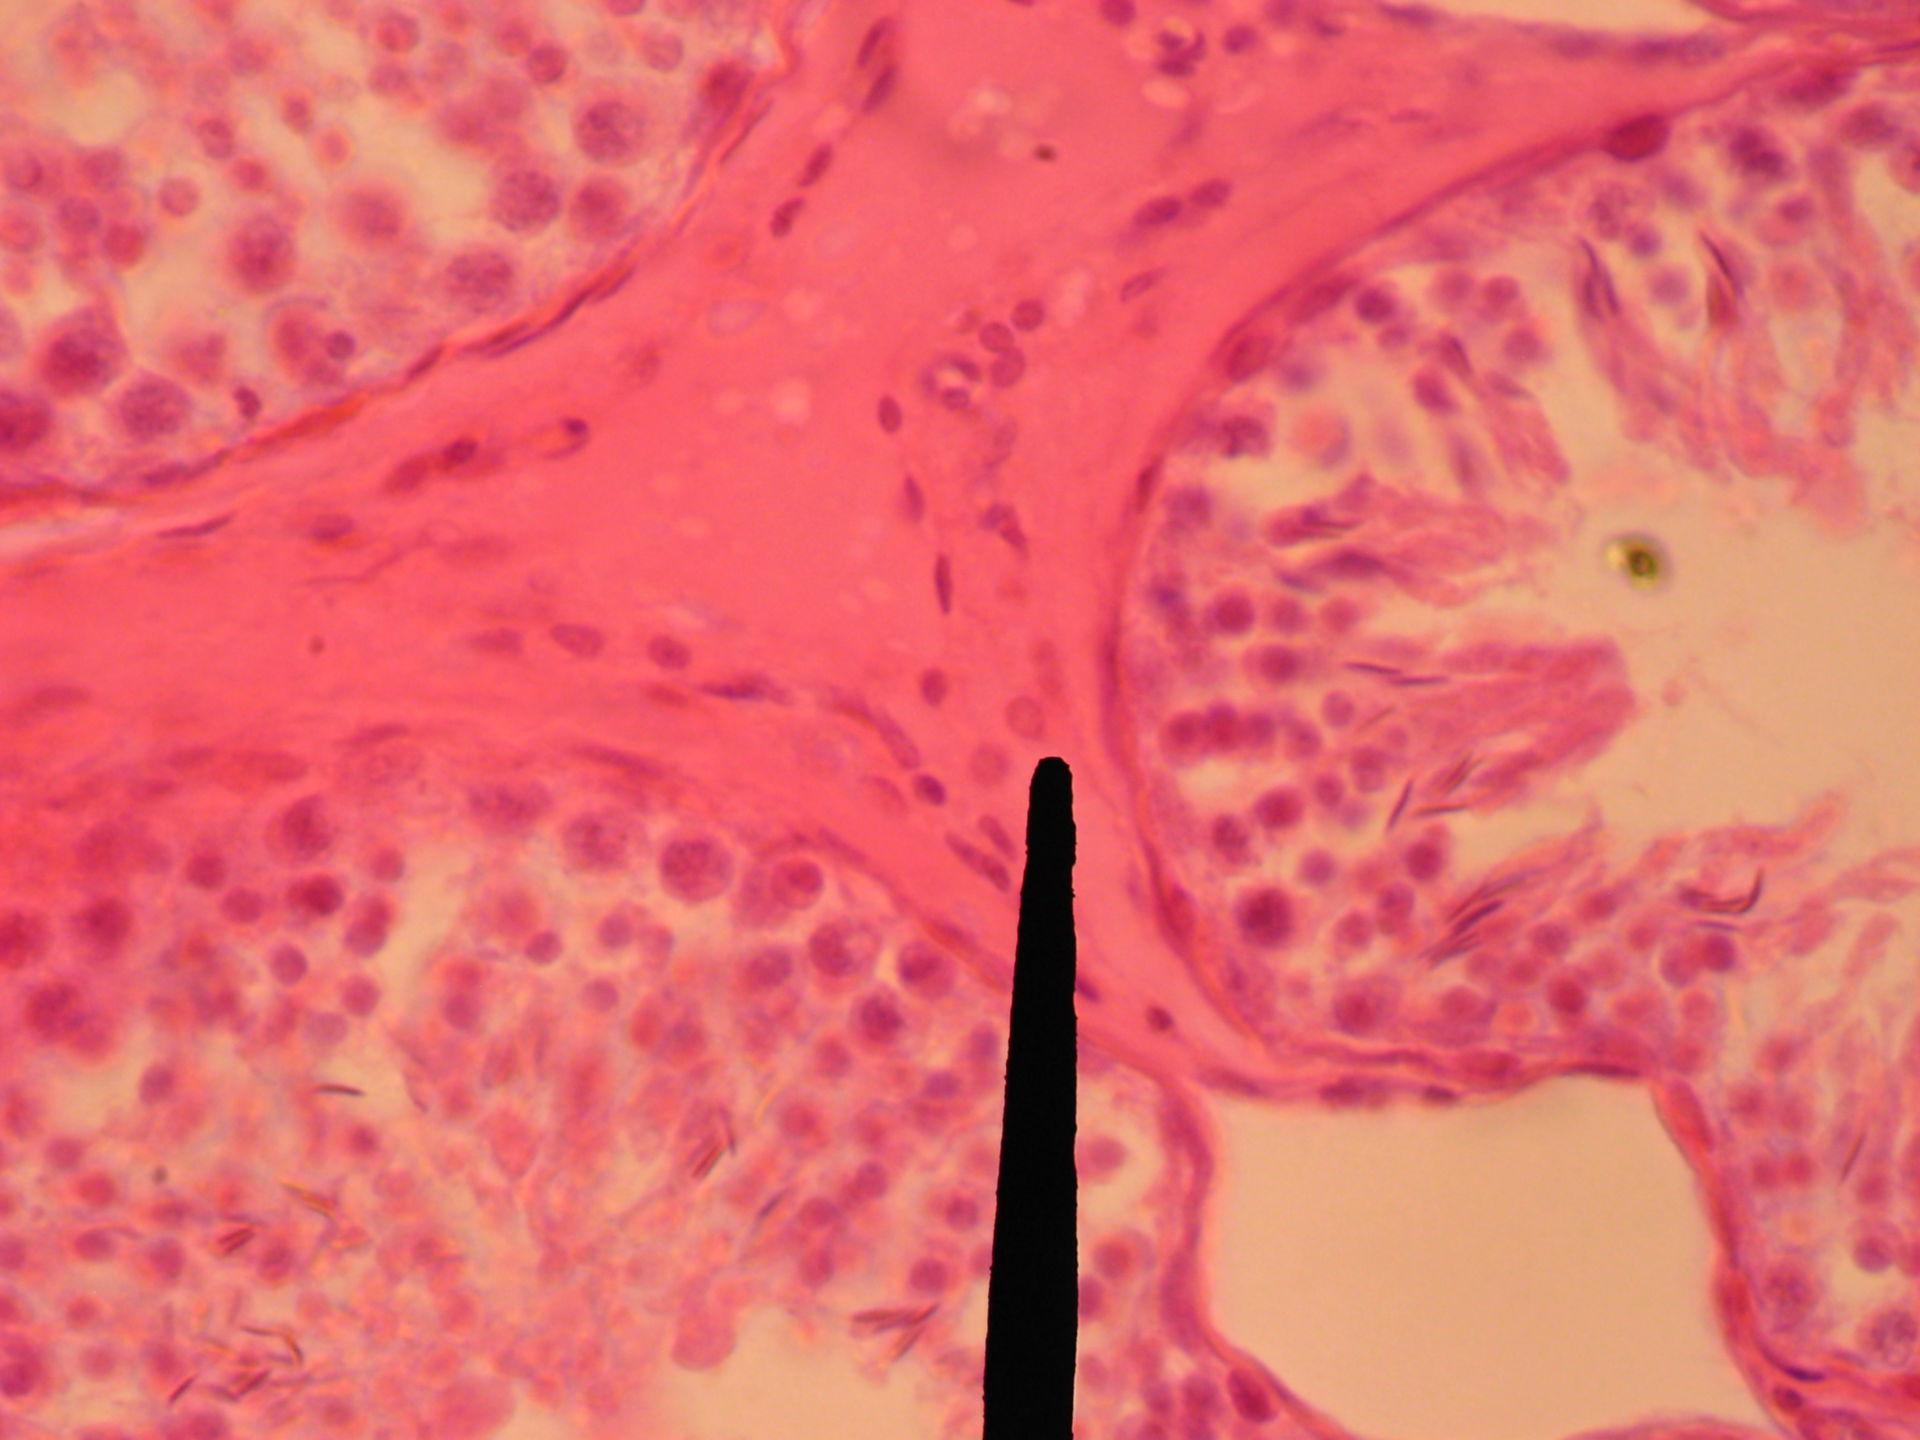 Hoden des Bullen (2) - Bindegewebe mit Leydig-Zelle